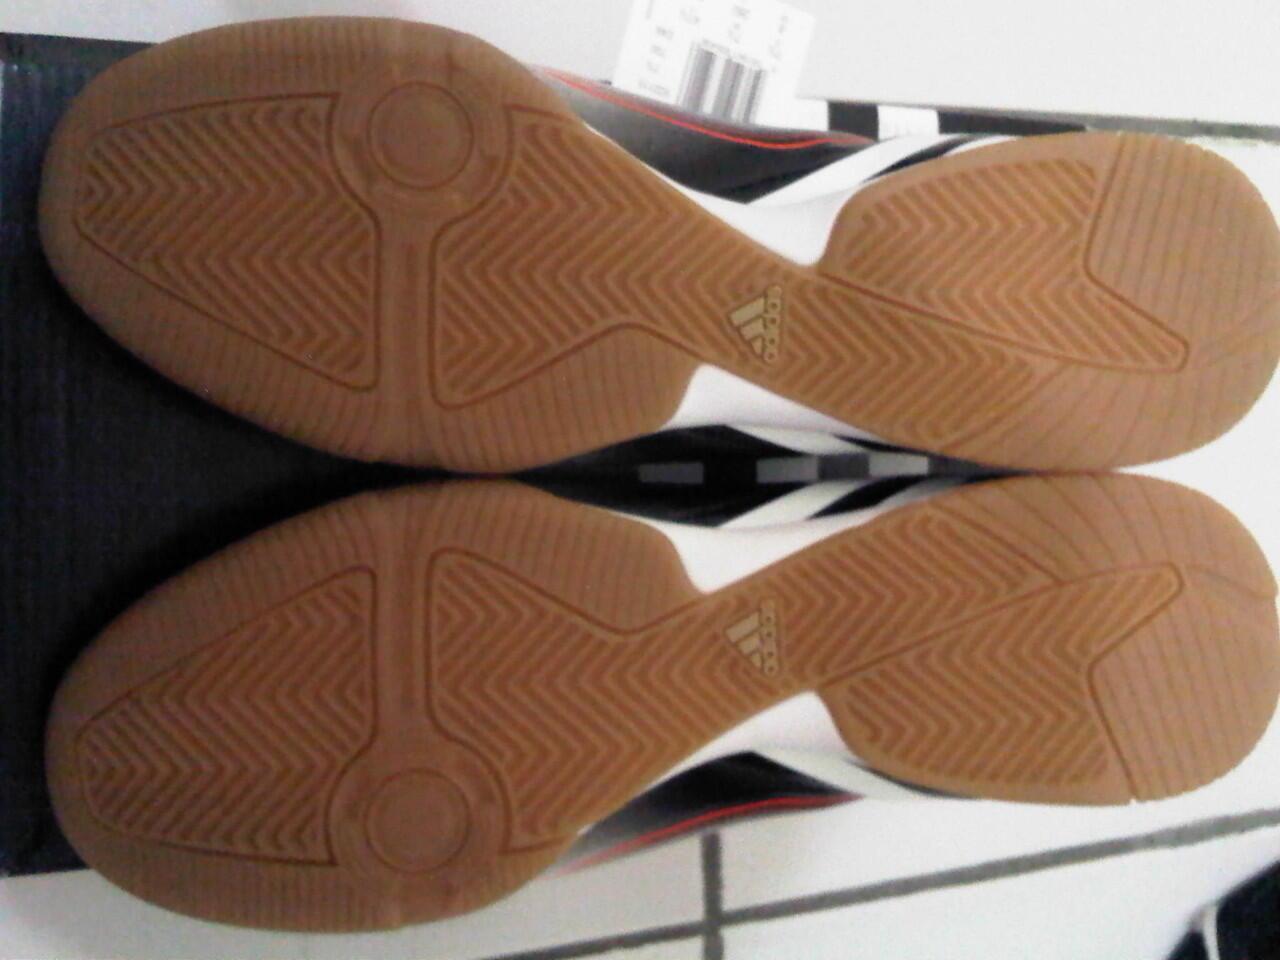 Sepatu Futsal Adidas Predator LZ IN